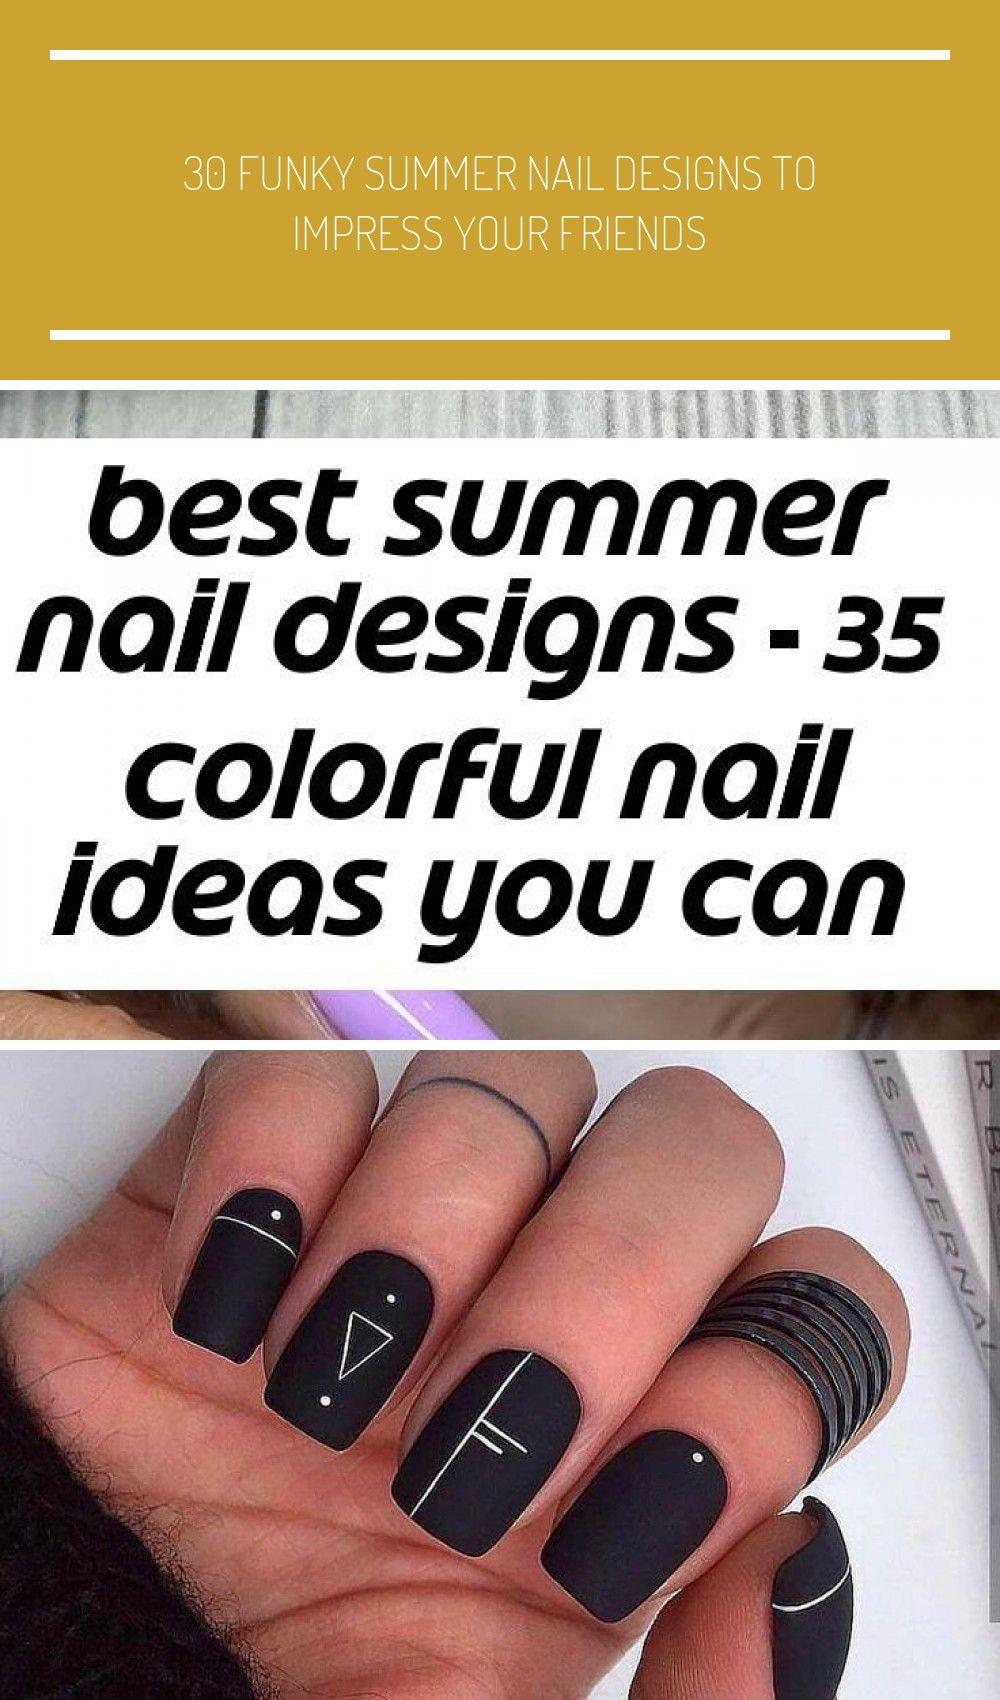 #coffinnails #colorfulnails YUNAI 24 STUKS Gemiddelde lengte Volledige dekking Valse nagels Fr …